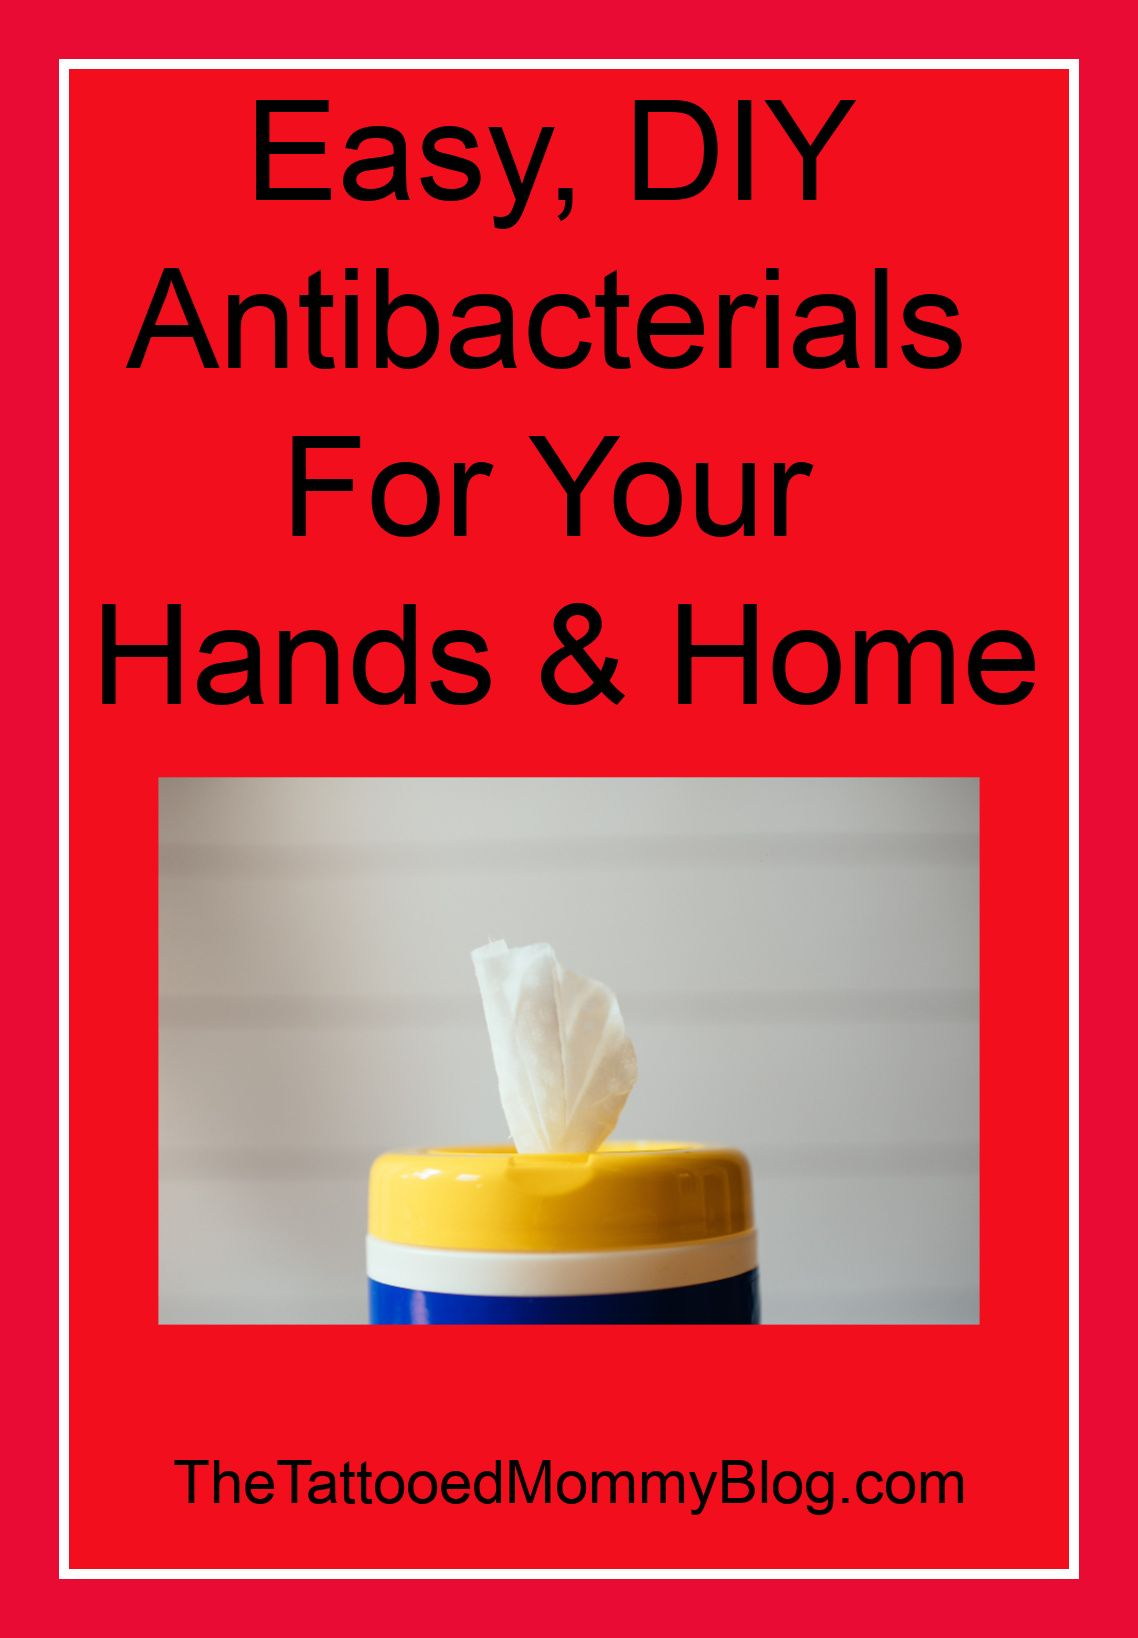 EASY, DIY Antibacterial For Your Hands & Home in 2020